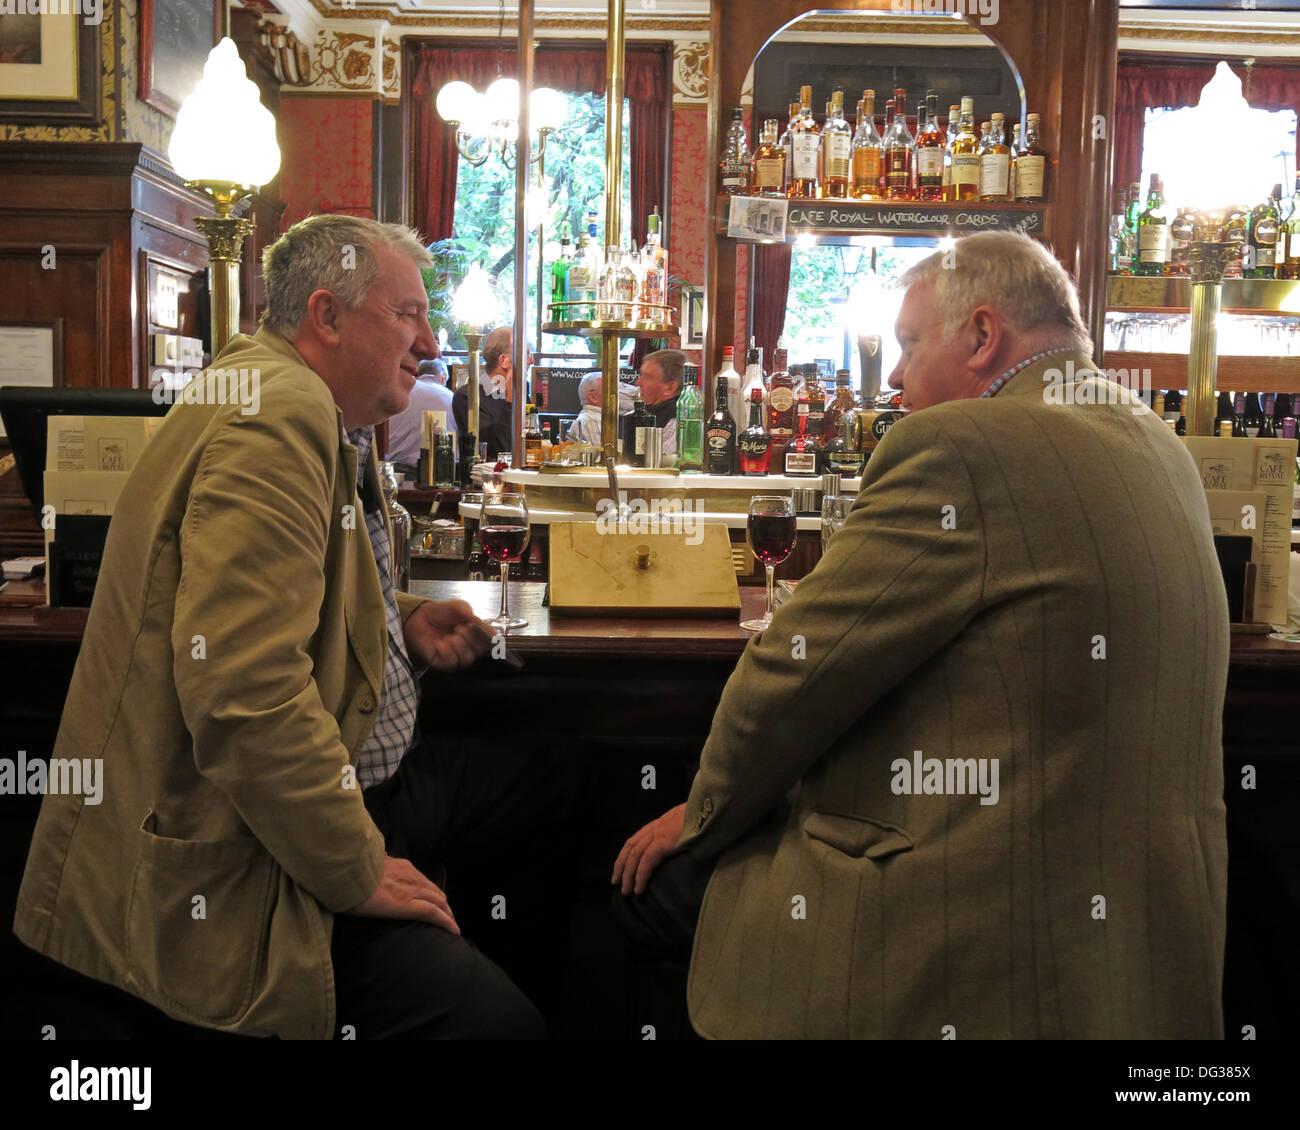 Two,2,drinkers,in,the,Cafe,Royal,Edinburgh,Scotland,UK,café,Royale,bar,pub,Scottish,connection,whisky,beer,ale,ales,2 drinkers,dark,winter,dusk,GoTonySmith